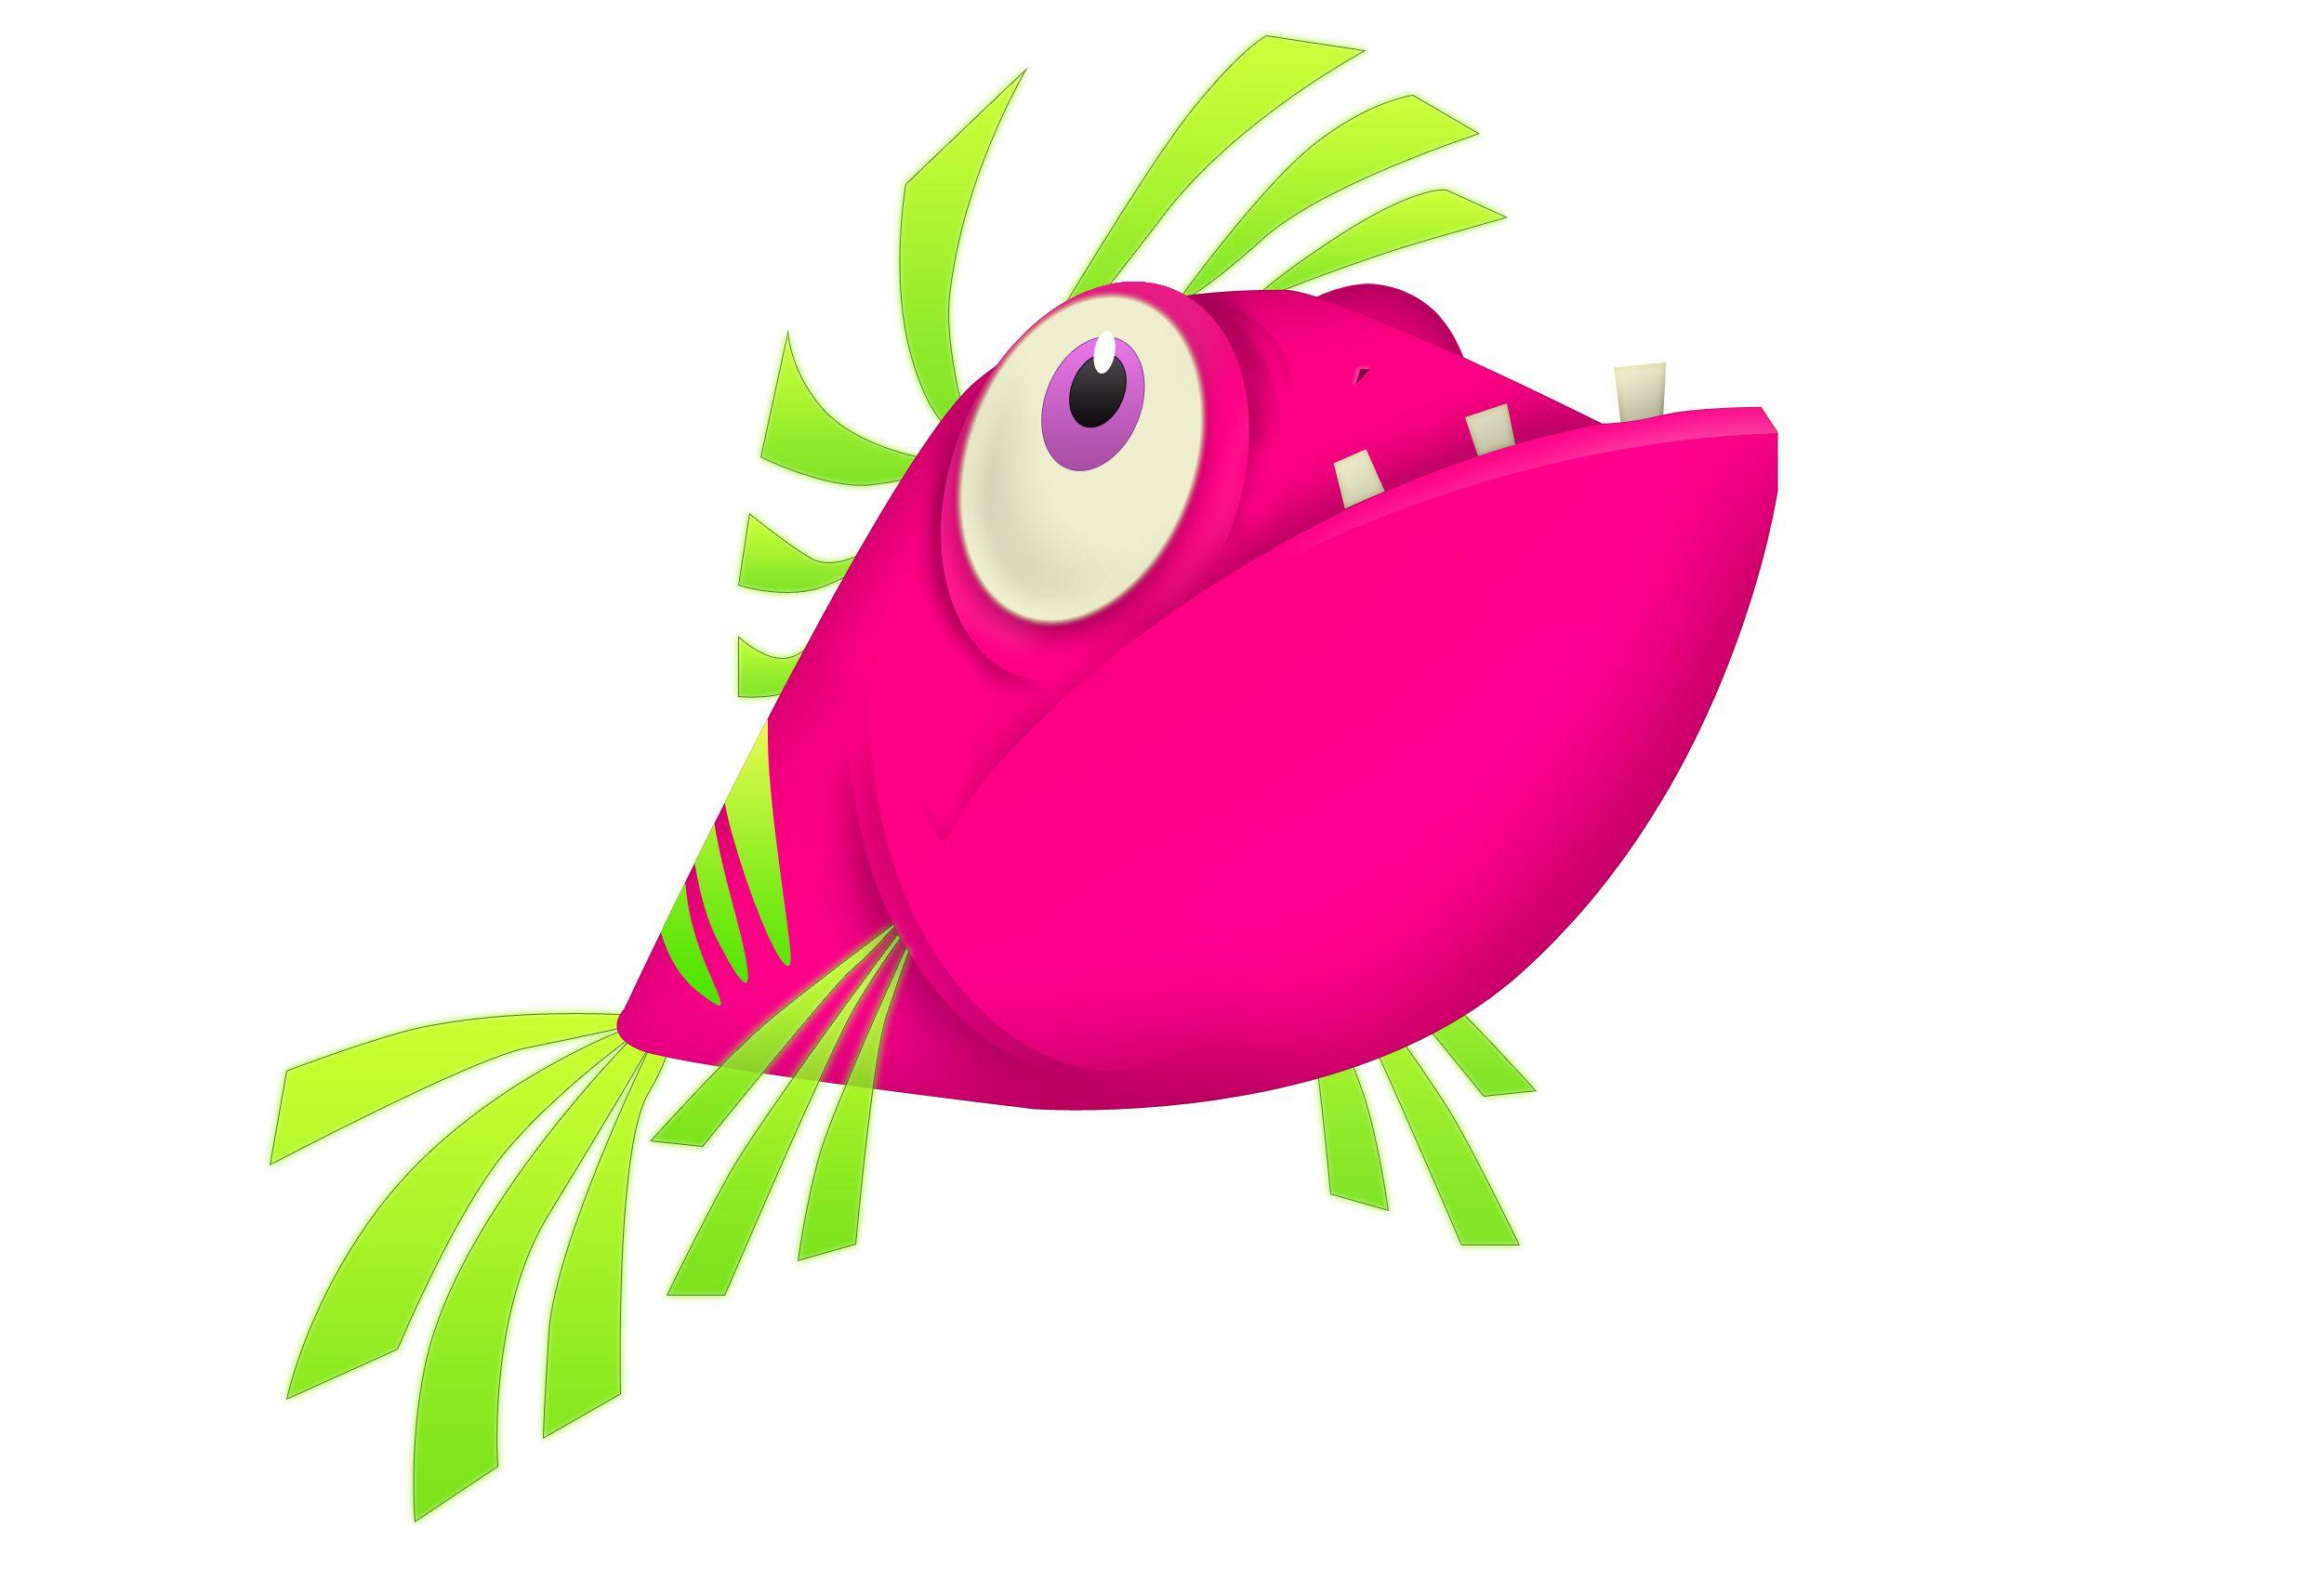 Exotic Pink Tropical Fish Character Royalty Free Stockazoo